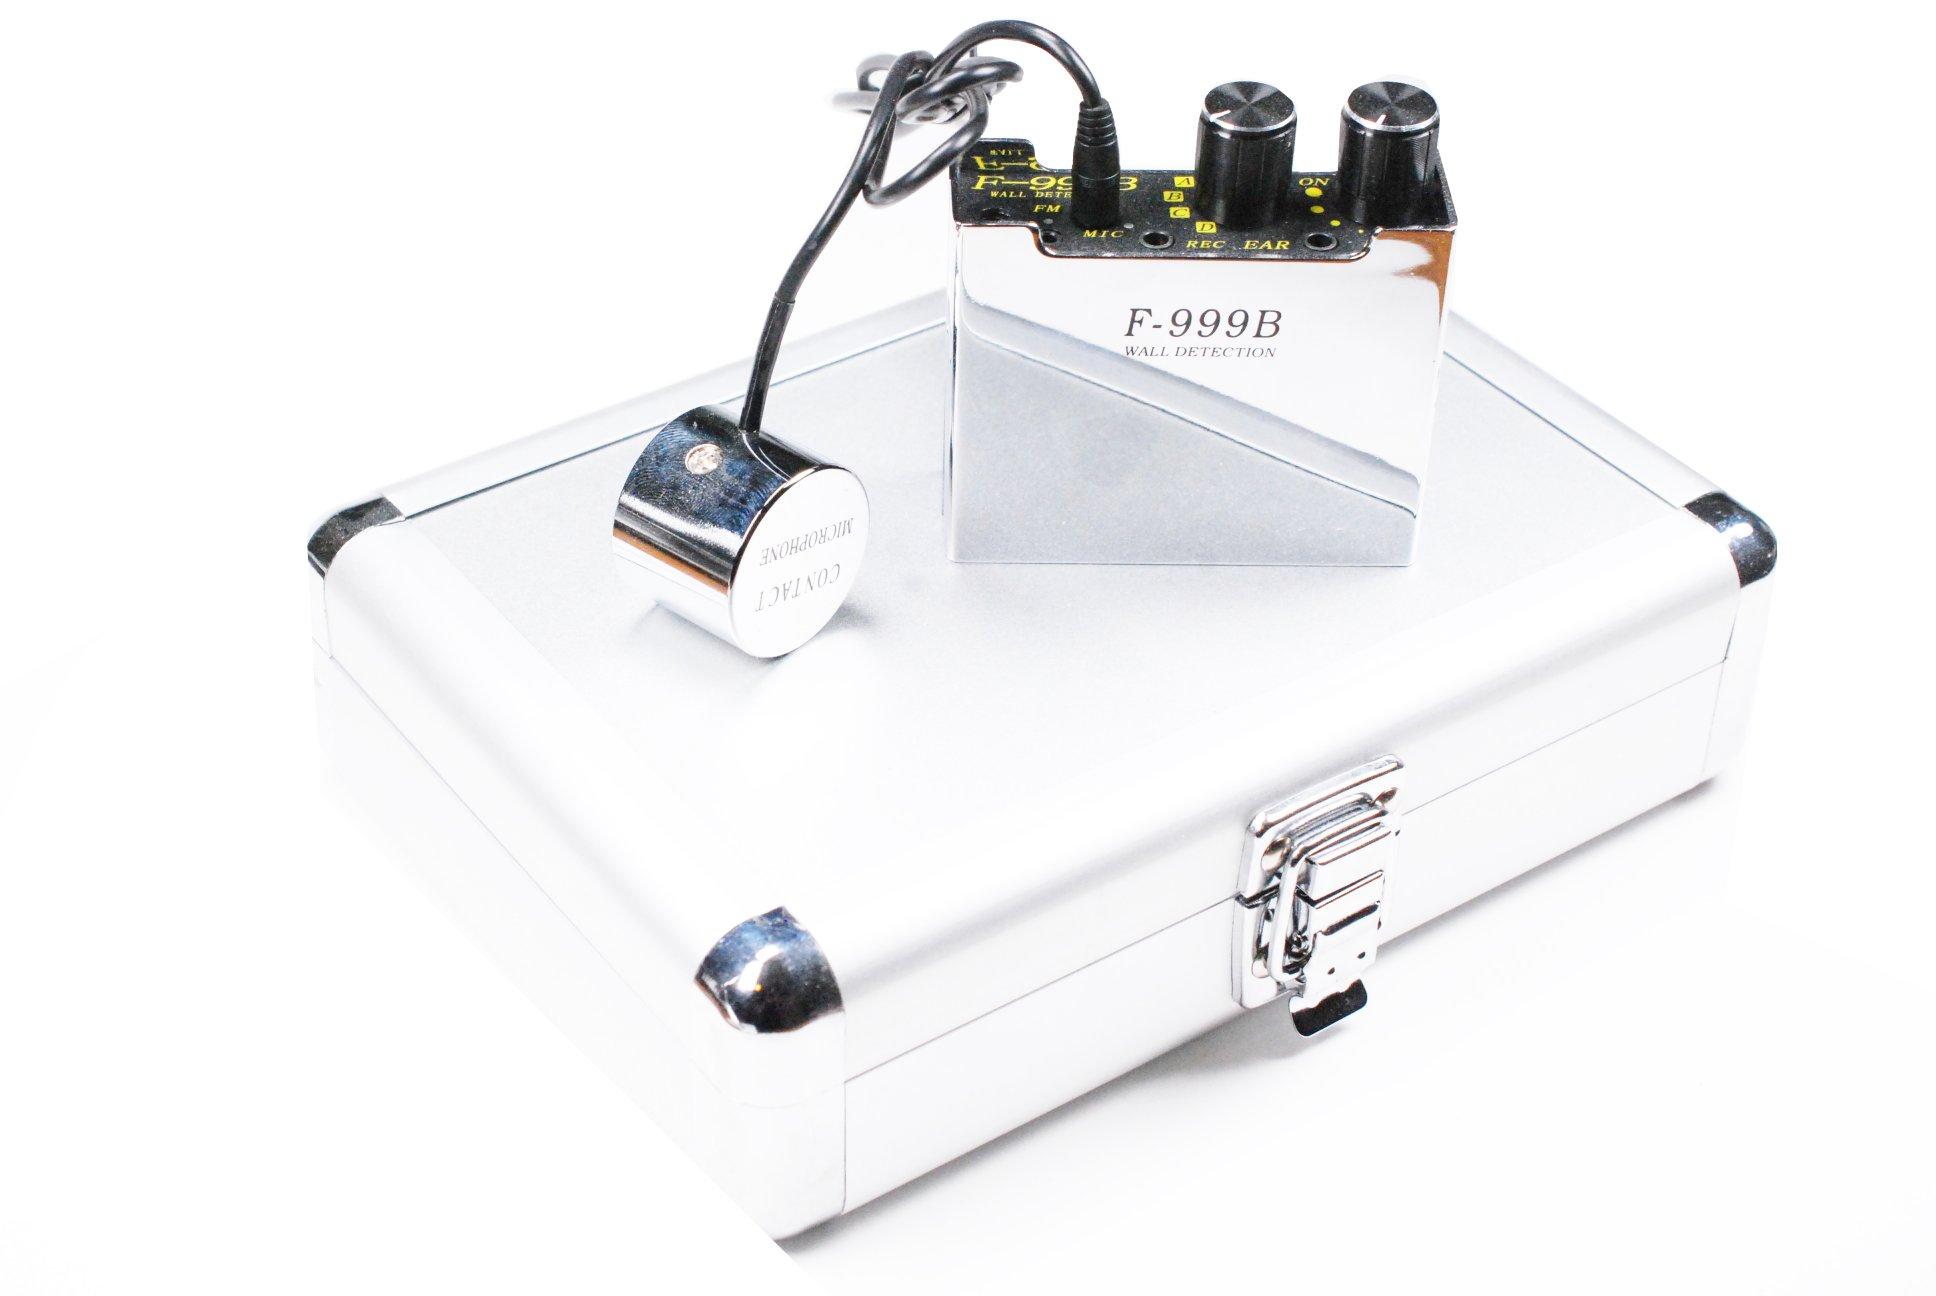 Dispozitiv de Ascultare prin Ziduri/Usi/Orificii - Professional II [S-58-RID]